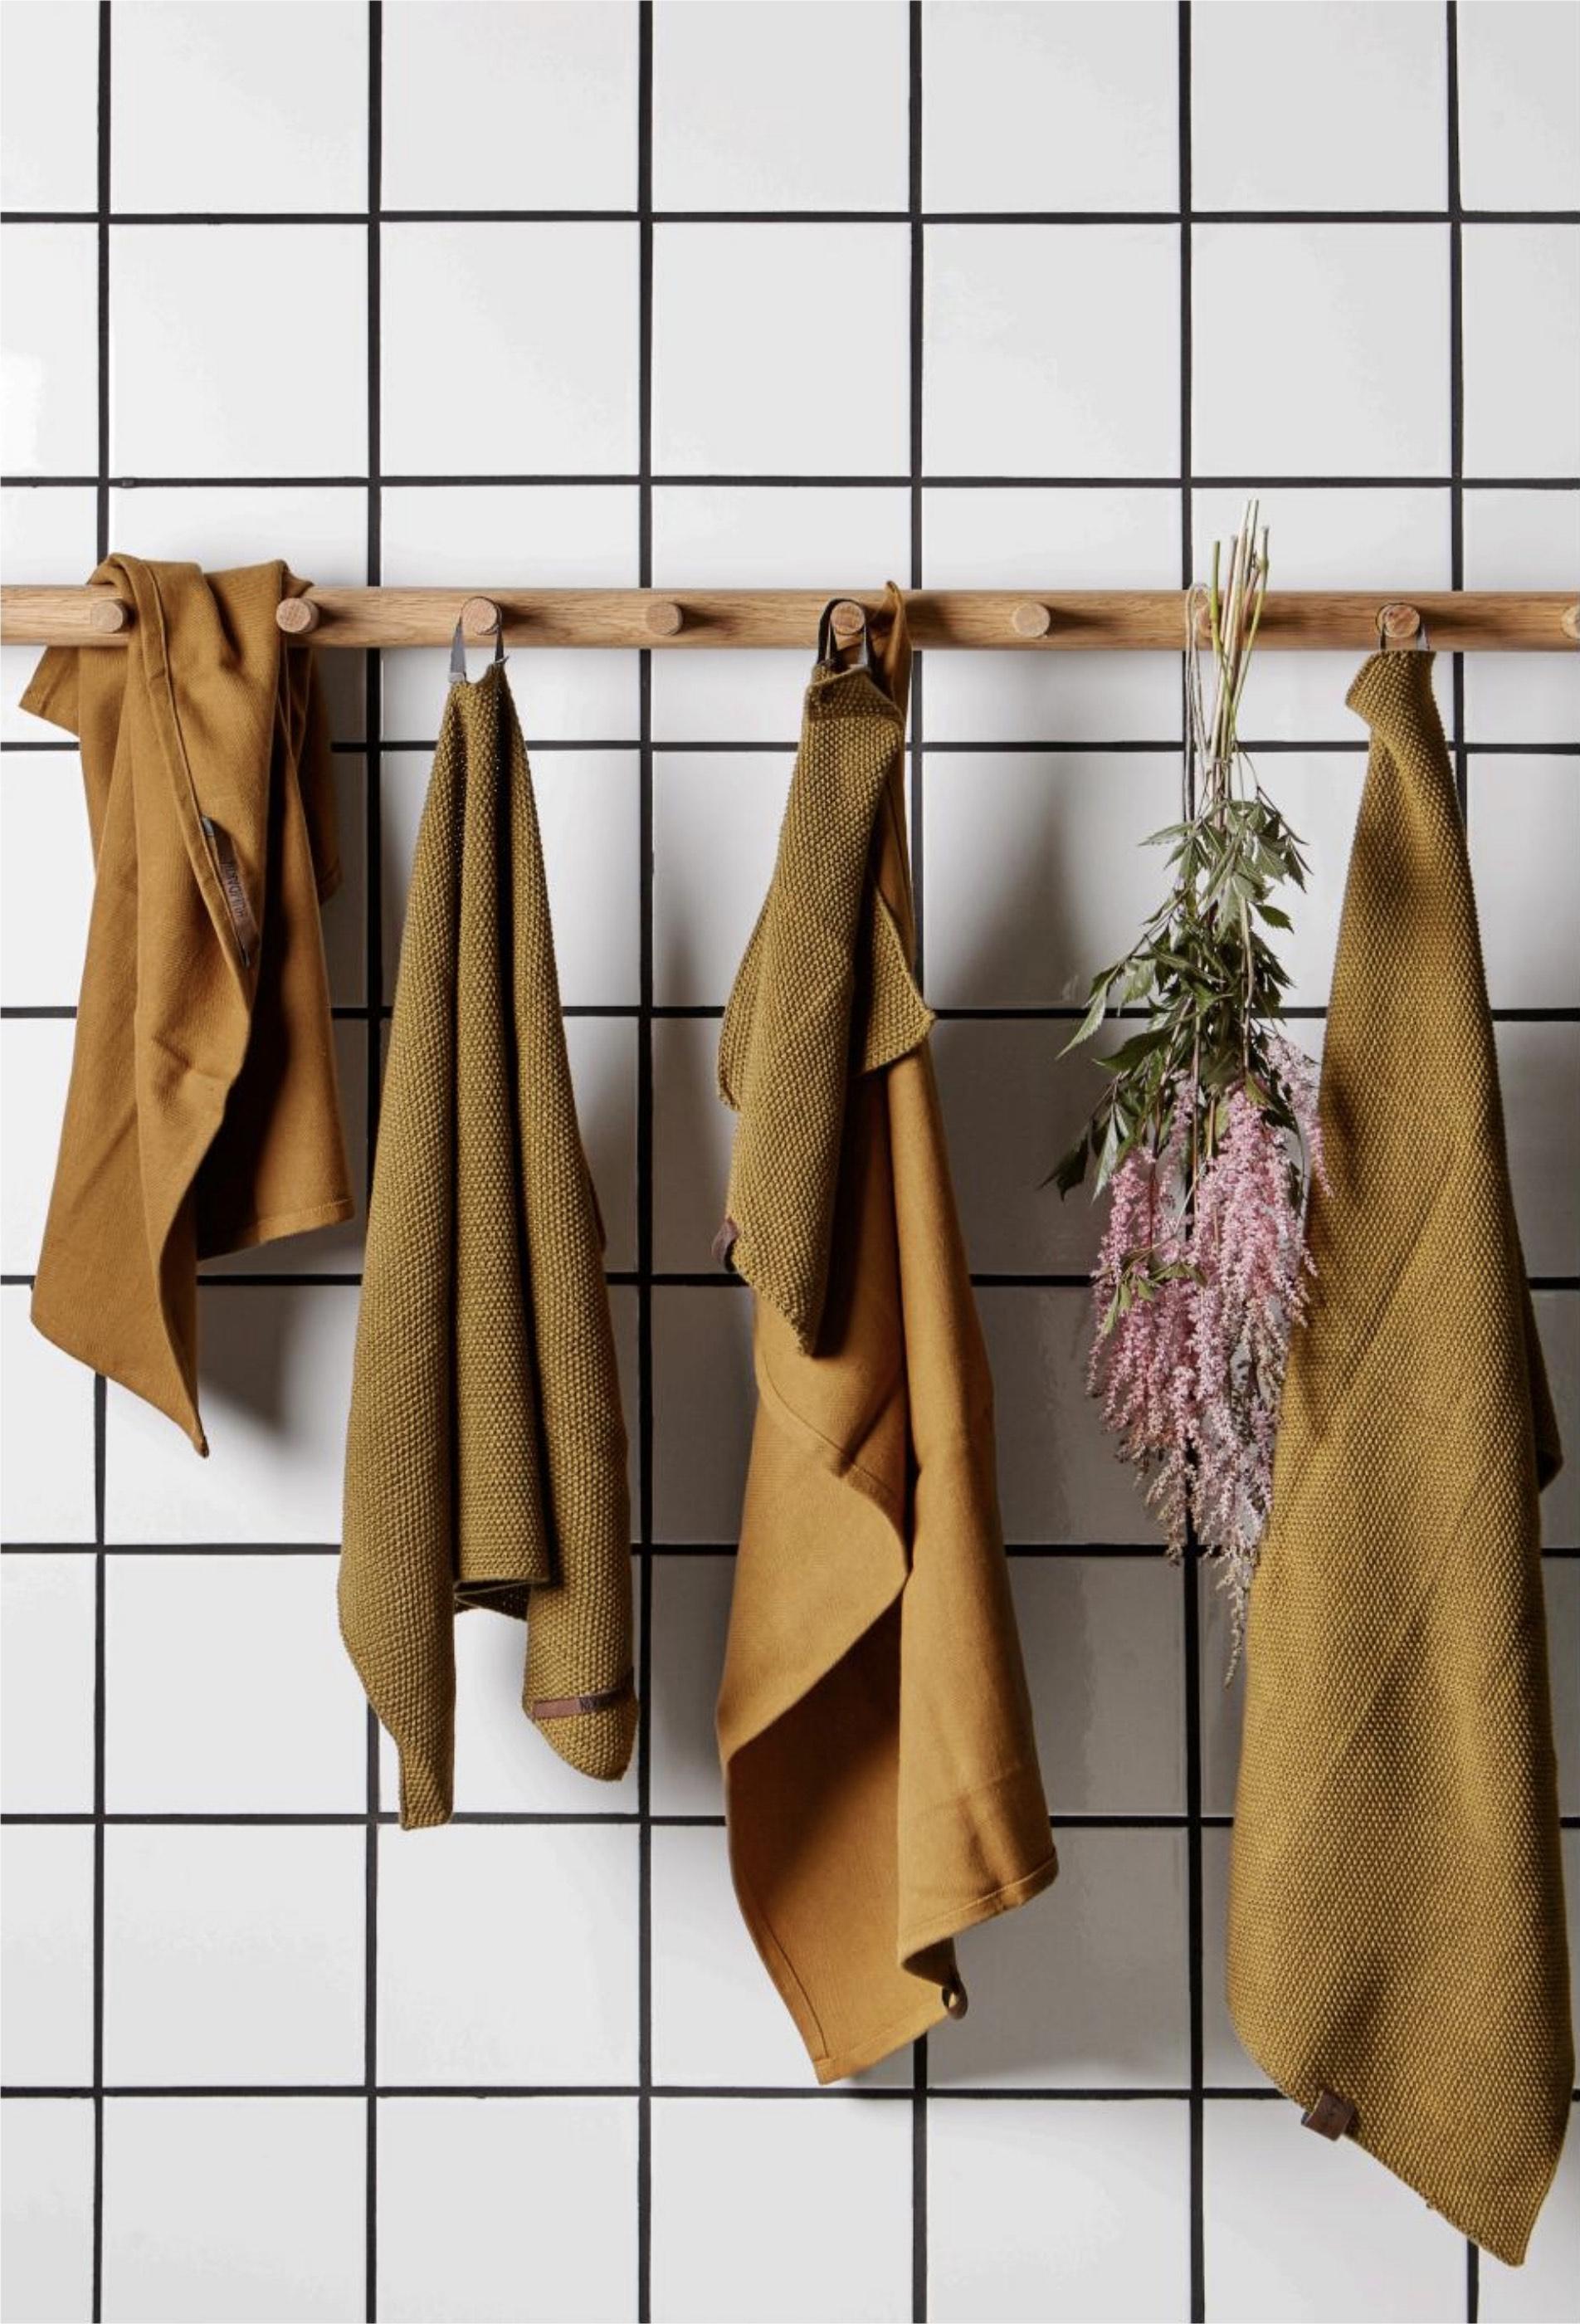 ASROSENVINGE_Humdakin_Formland_Textiles_Kitchen_Curry.jpg